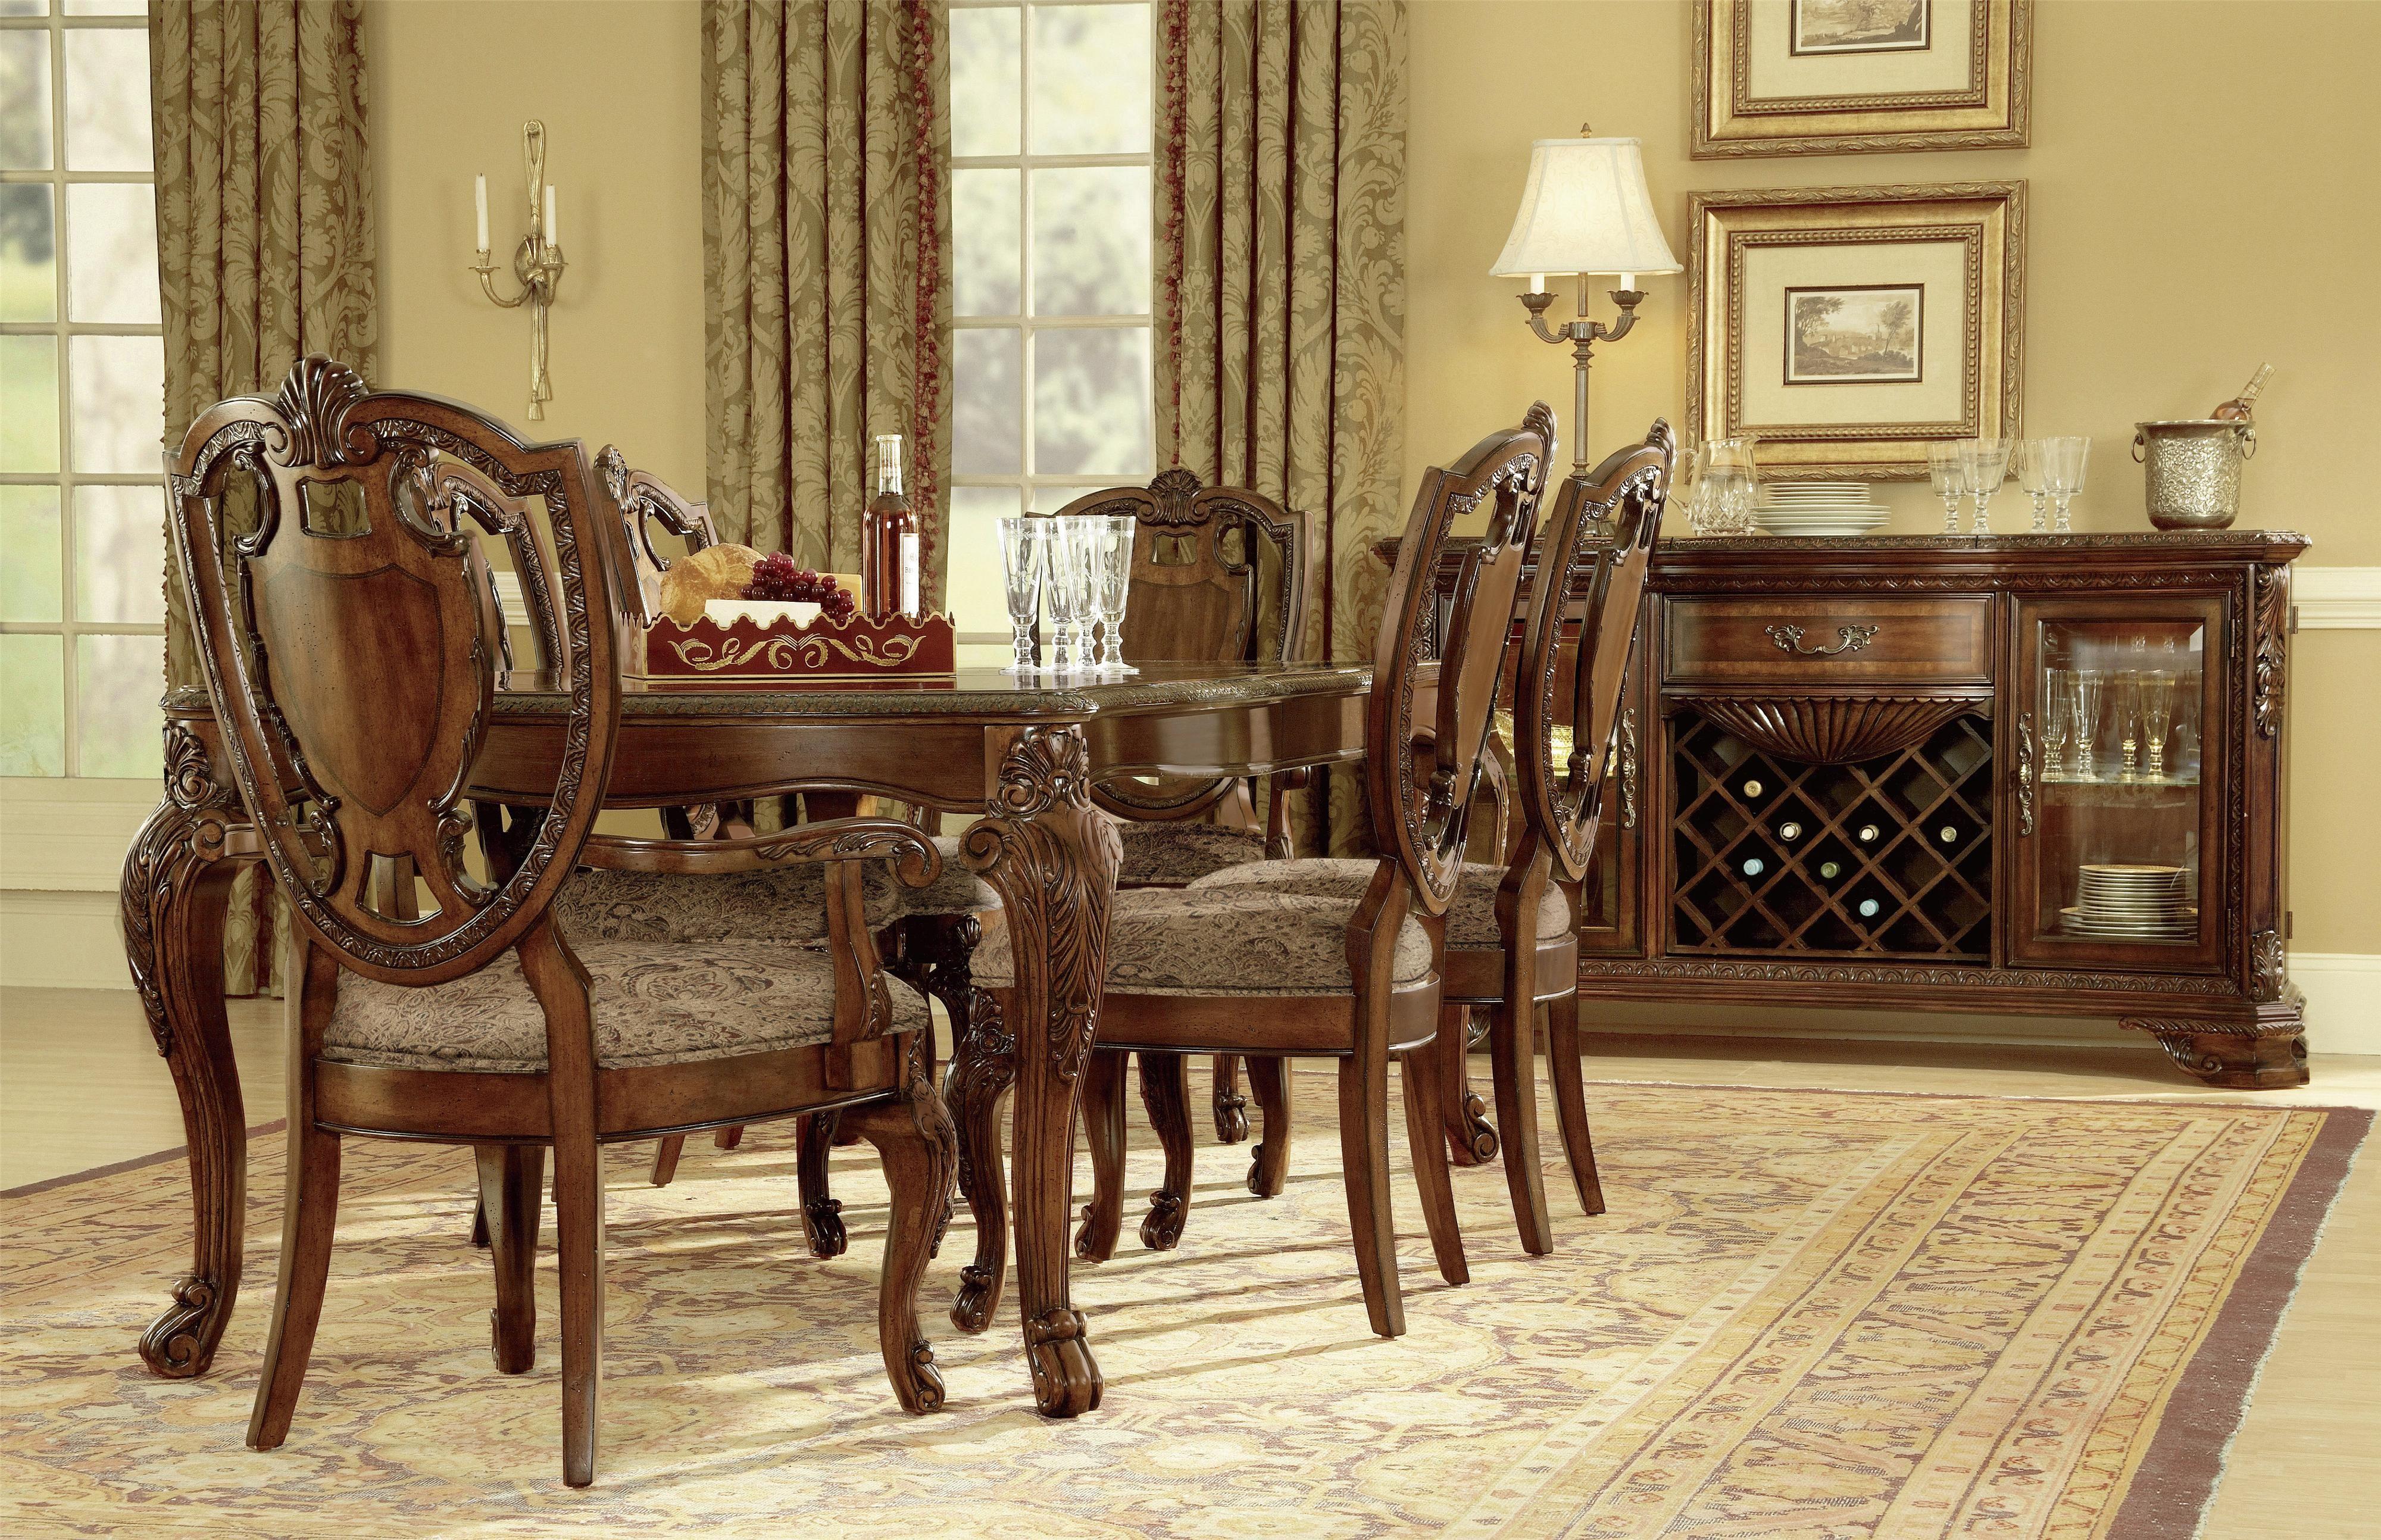 World Formal Dining Room Group Item Number Kanes Furniture Sets Excellent Pinele Base Table Decor Chris Madden With